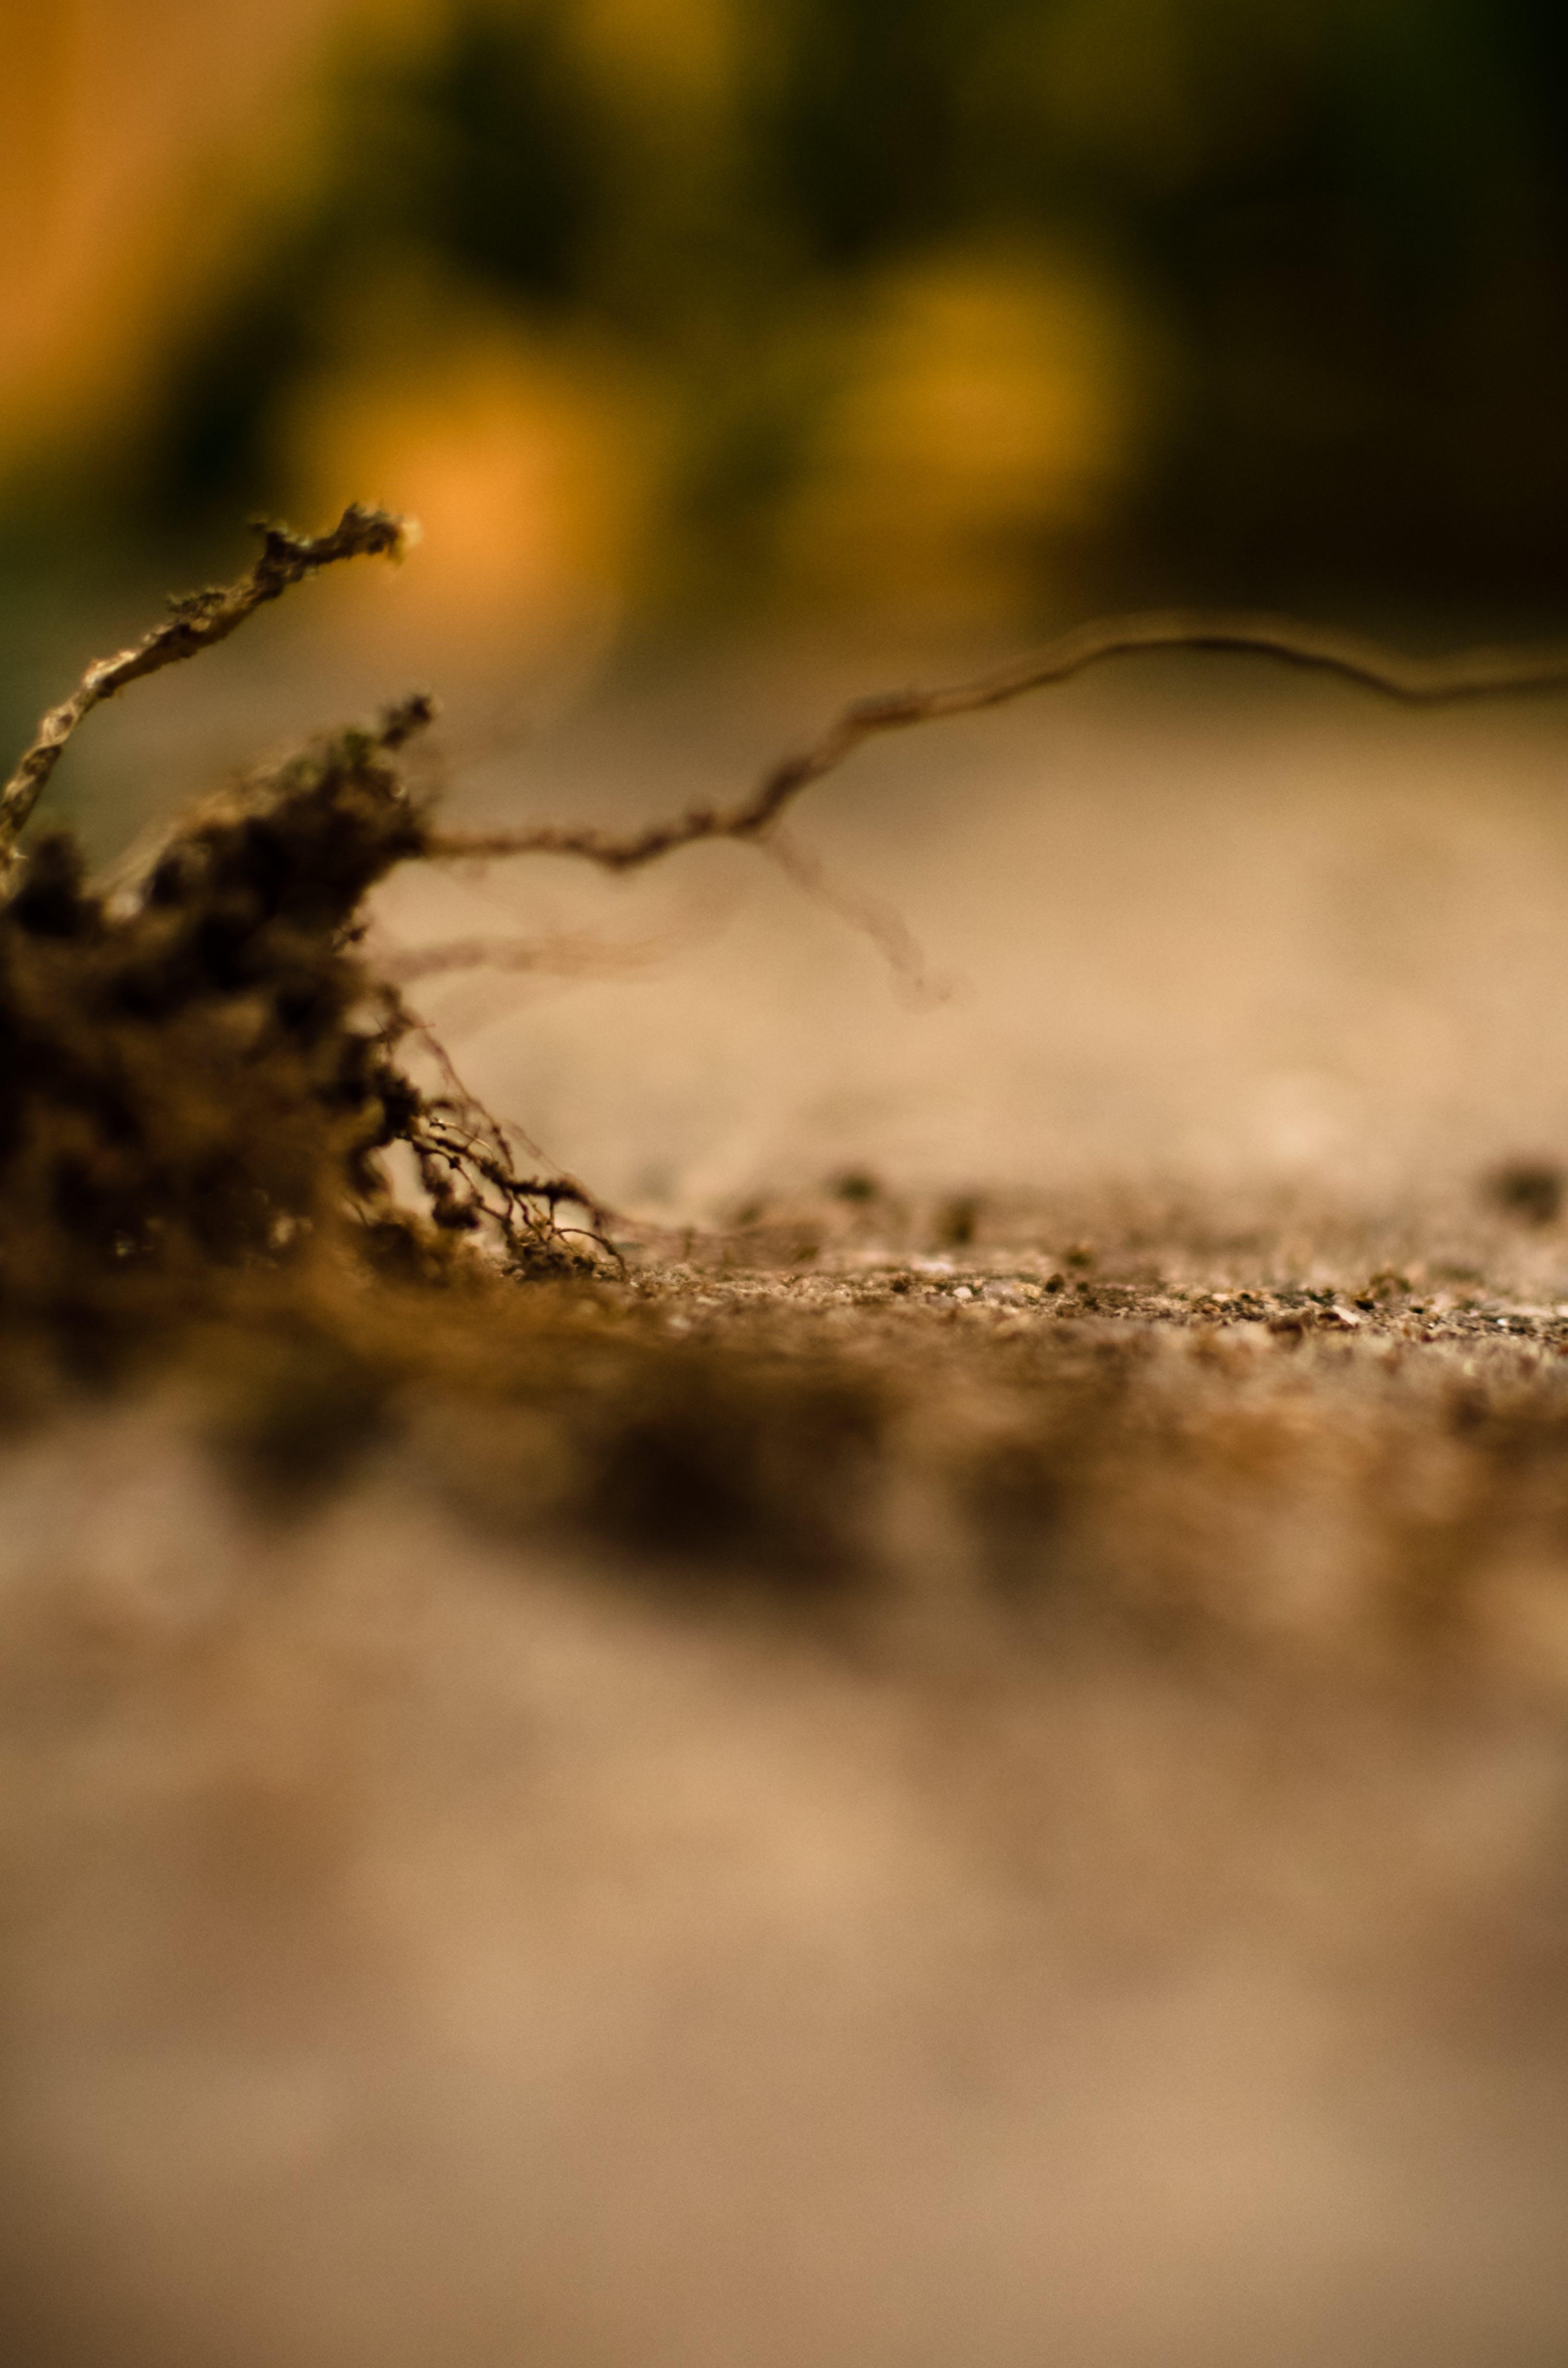 Free stock photo of land, roots, miniature, unfocused